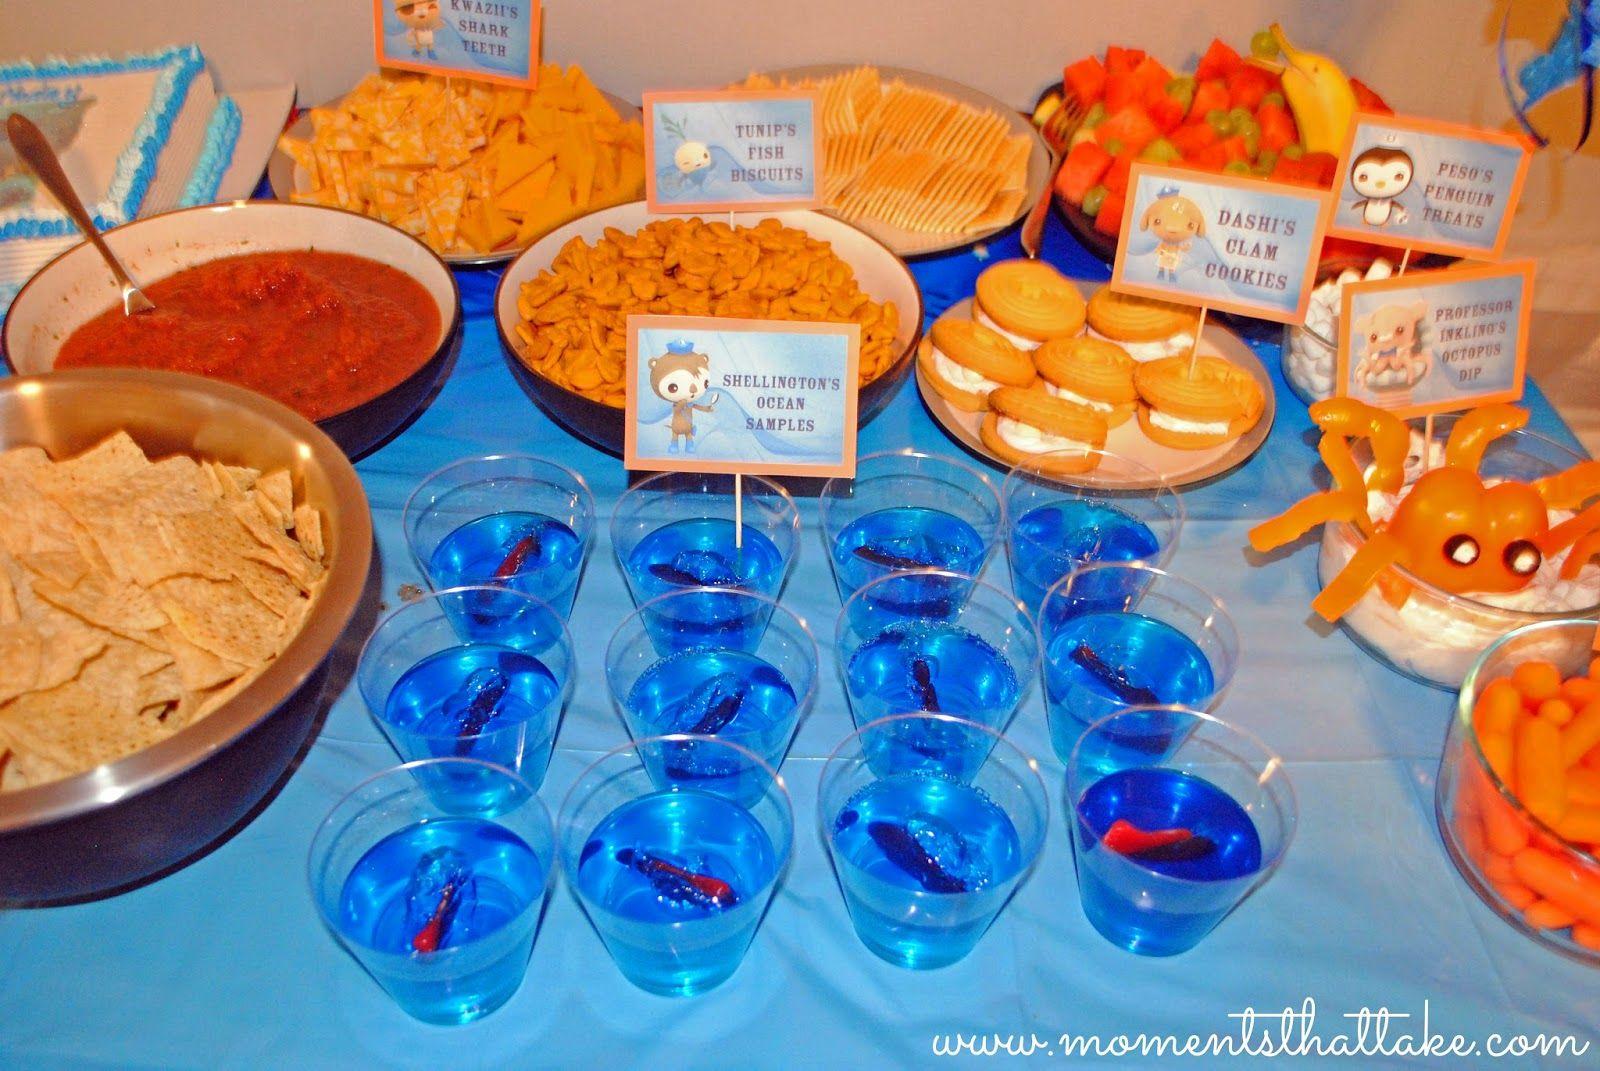 Octonauts birthday party food ideas shellington 39 s ocean for Fish meal ideas